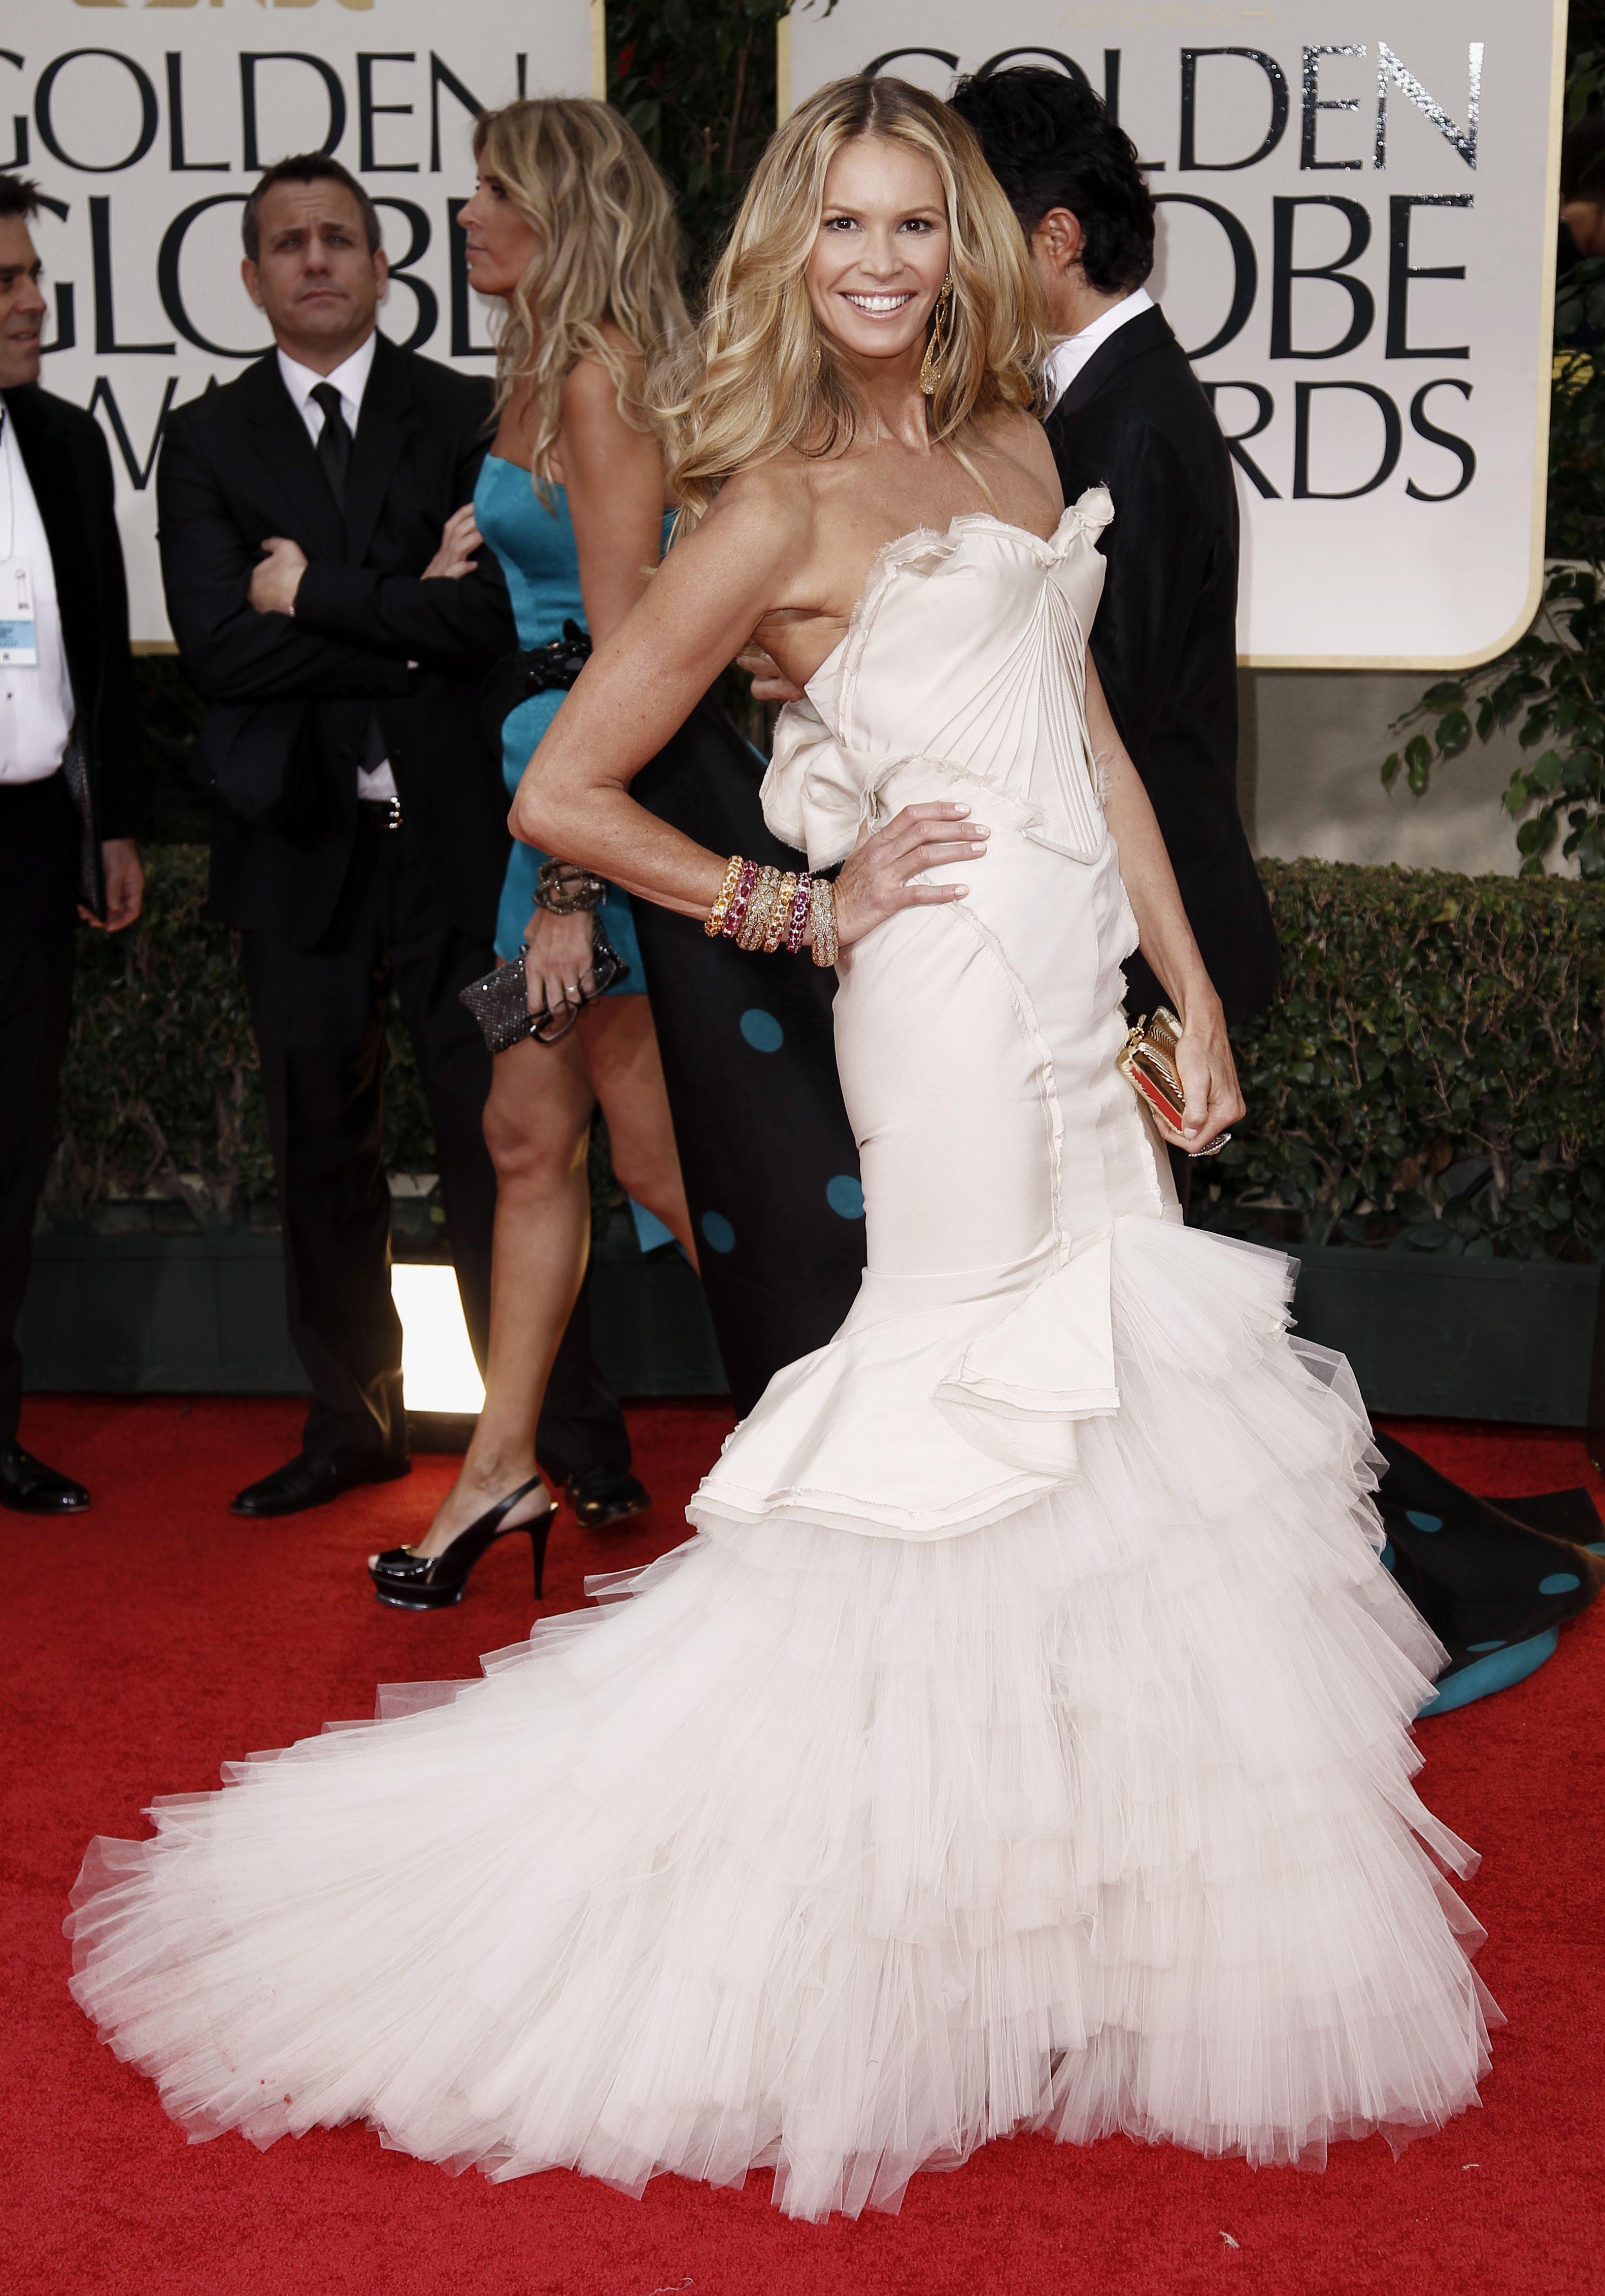 Golden Globe: Elle McPherson